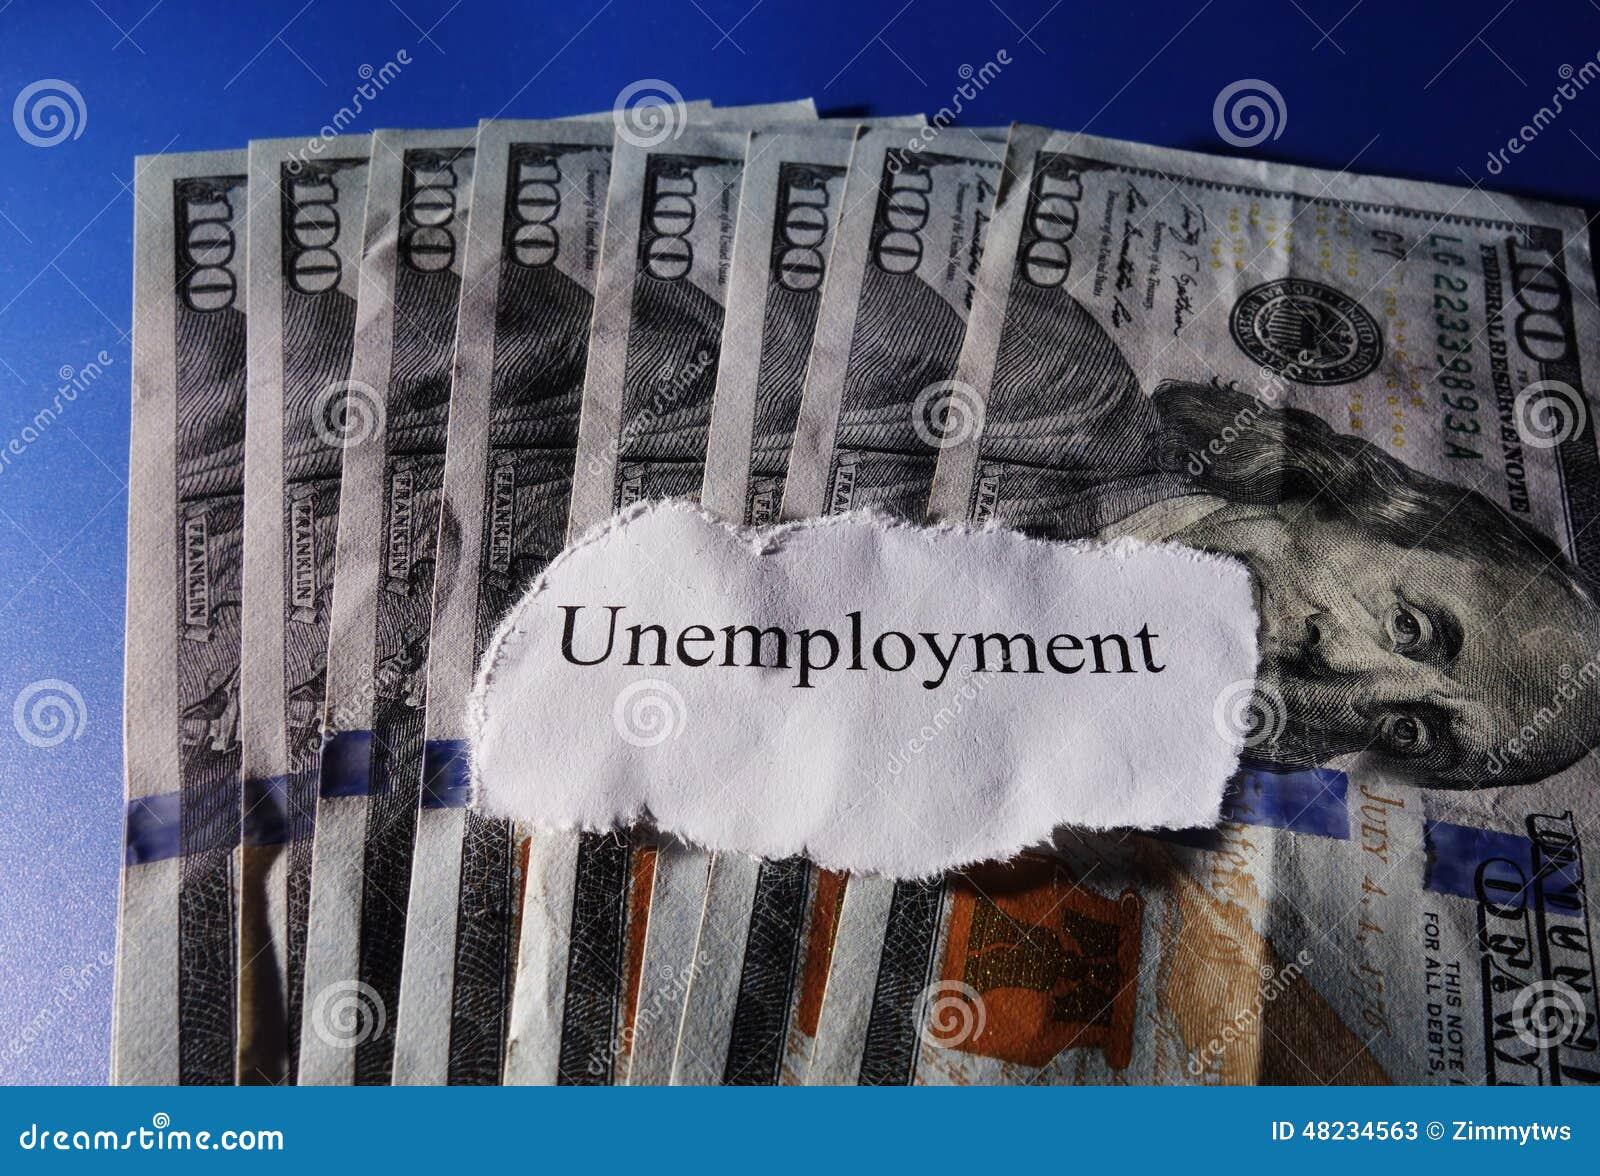 Macroeconomics Research Paper On Unemployment